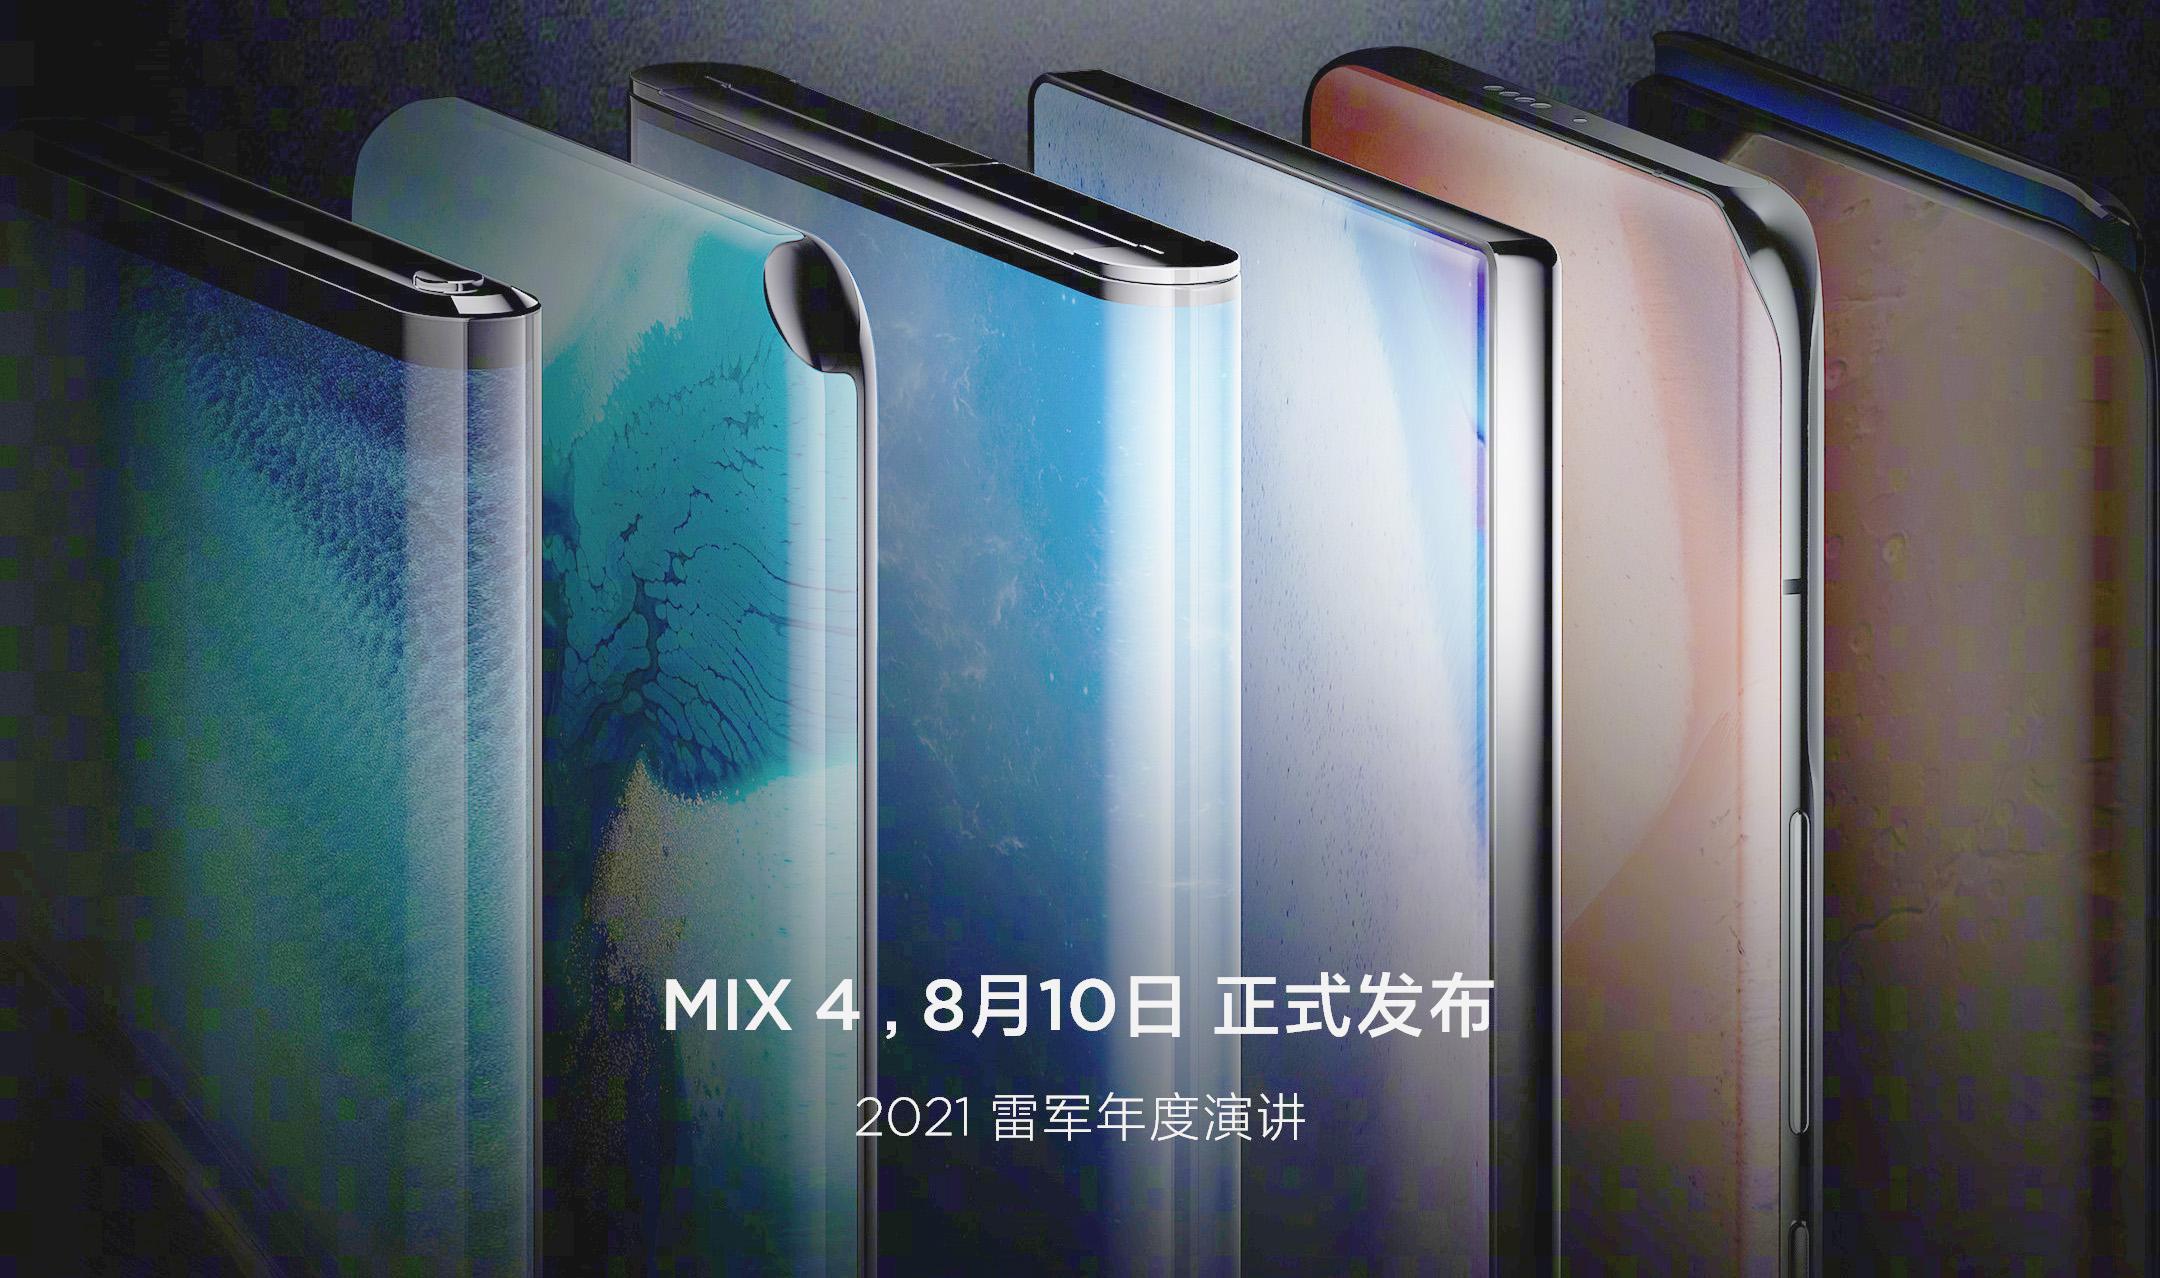 Xiaomi показала отменённые проекты по Mi Mix Xiaomi  - xiaomi_pokazala_otmenennye_proekty_serii_mi_mix_picture2_1